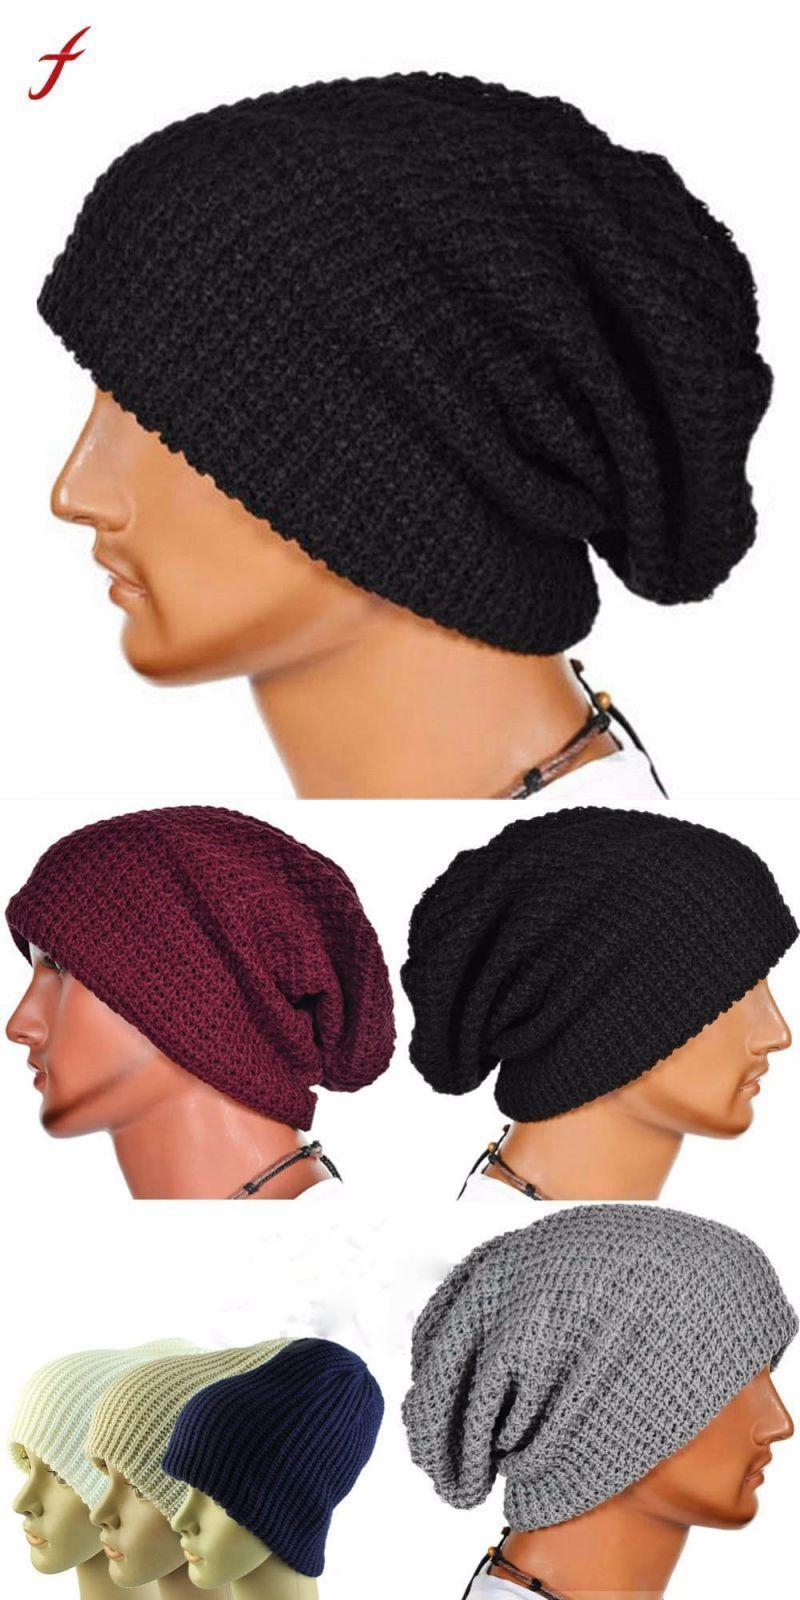 b07c0a6098f 2018 warm fashion winter hat for men knitting hat cap women beanie hat cap  skullies beanies elastic hats drop shipping  cotton